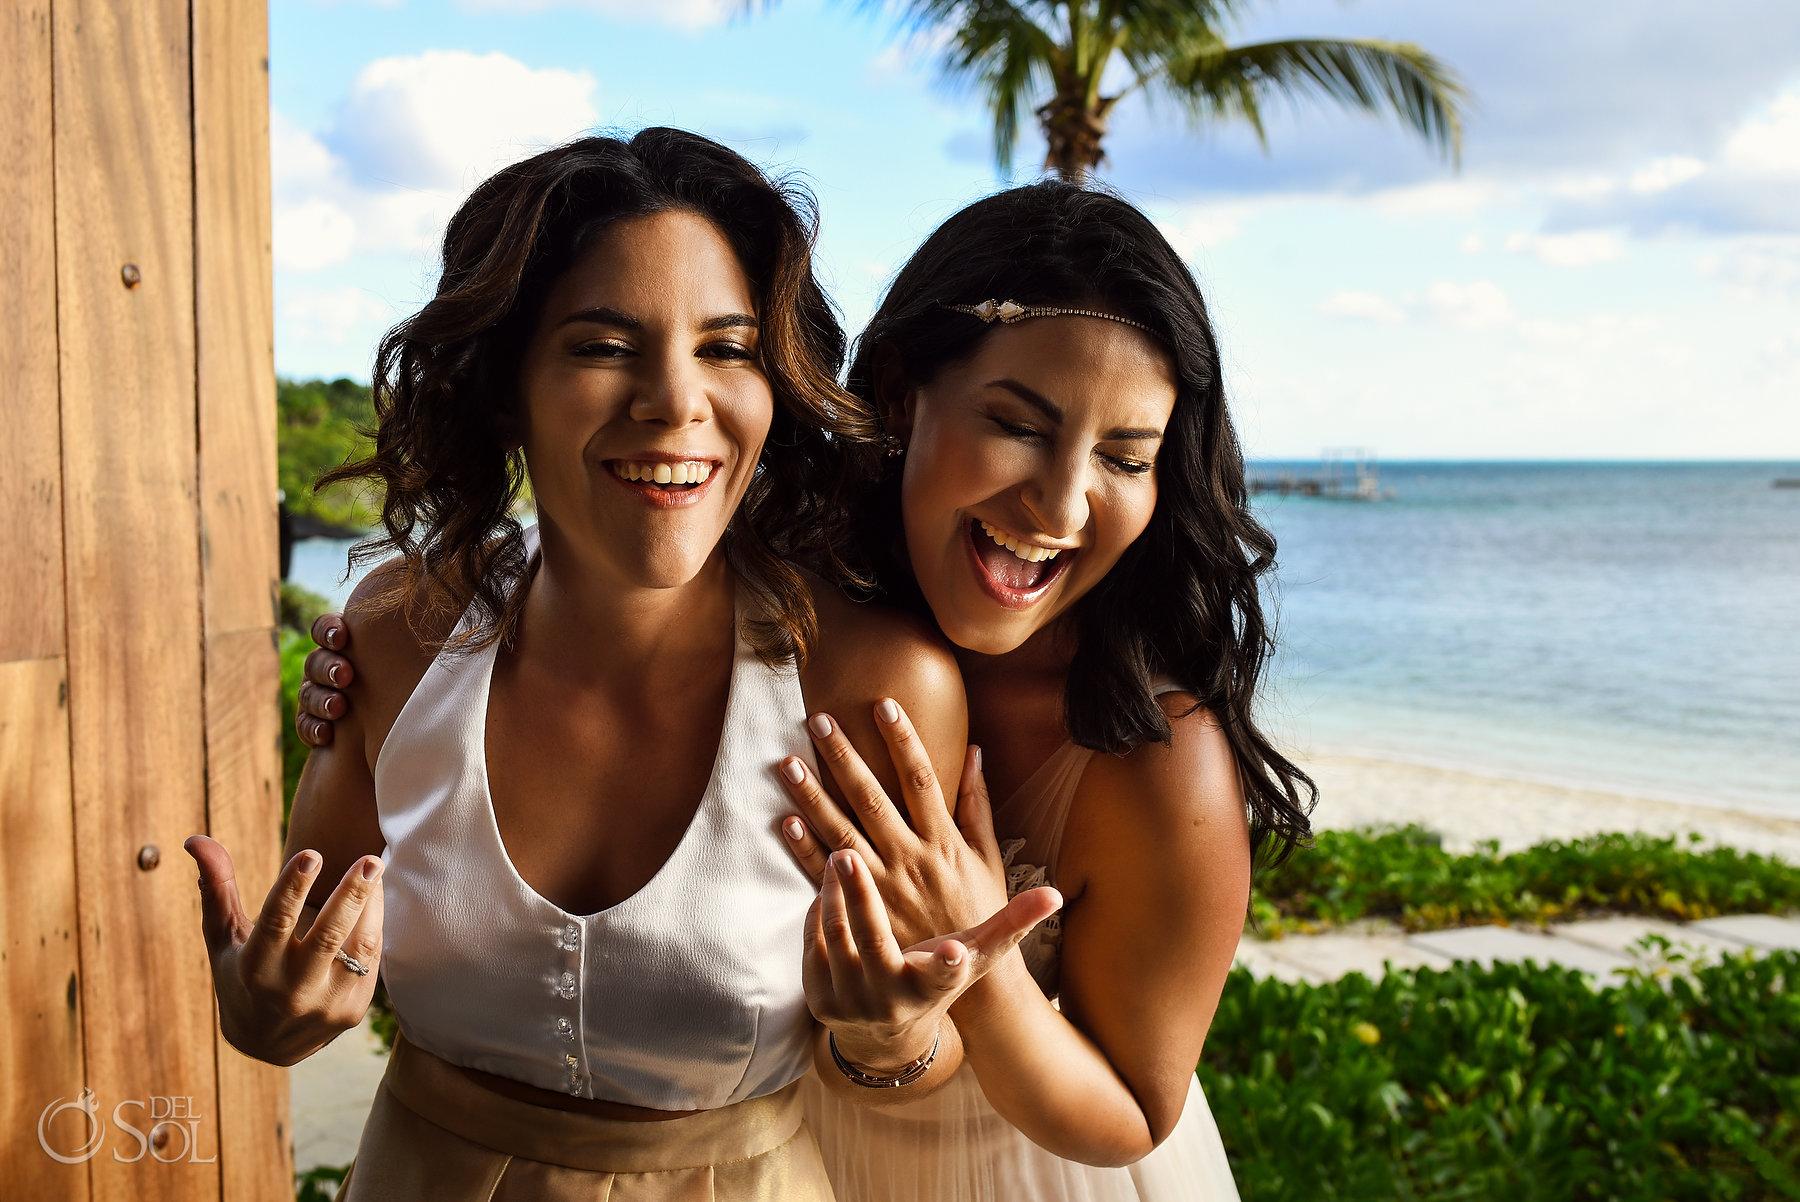 Nizuc gay wedding two brides laughing candid portrait